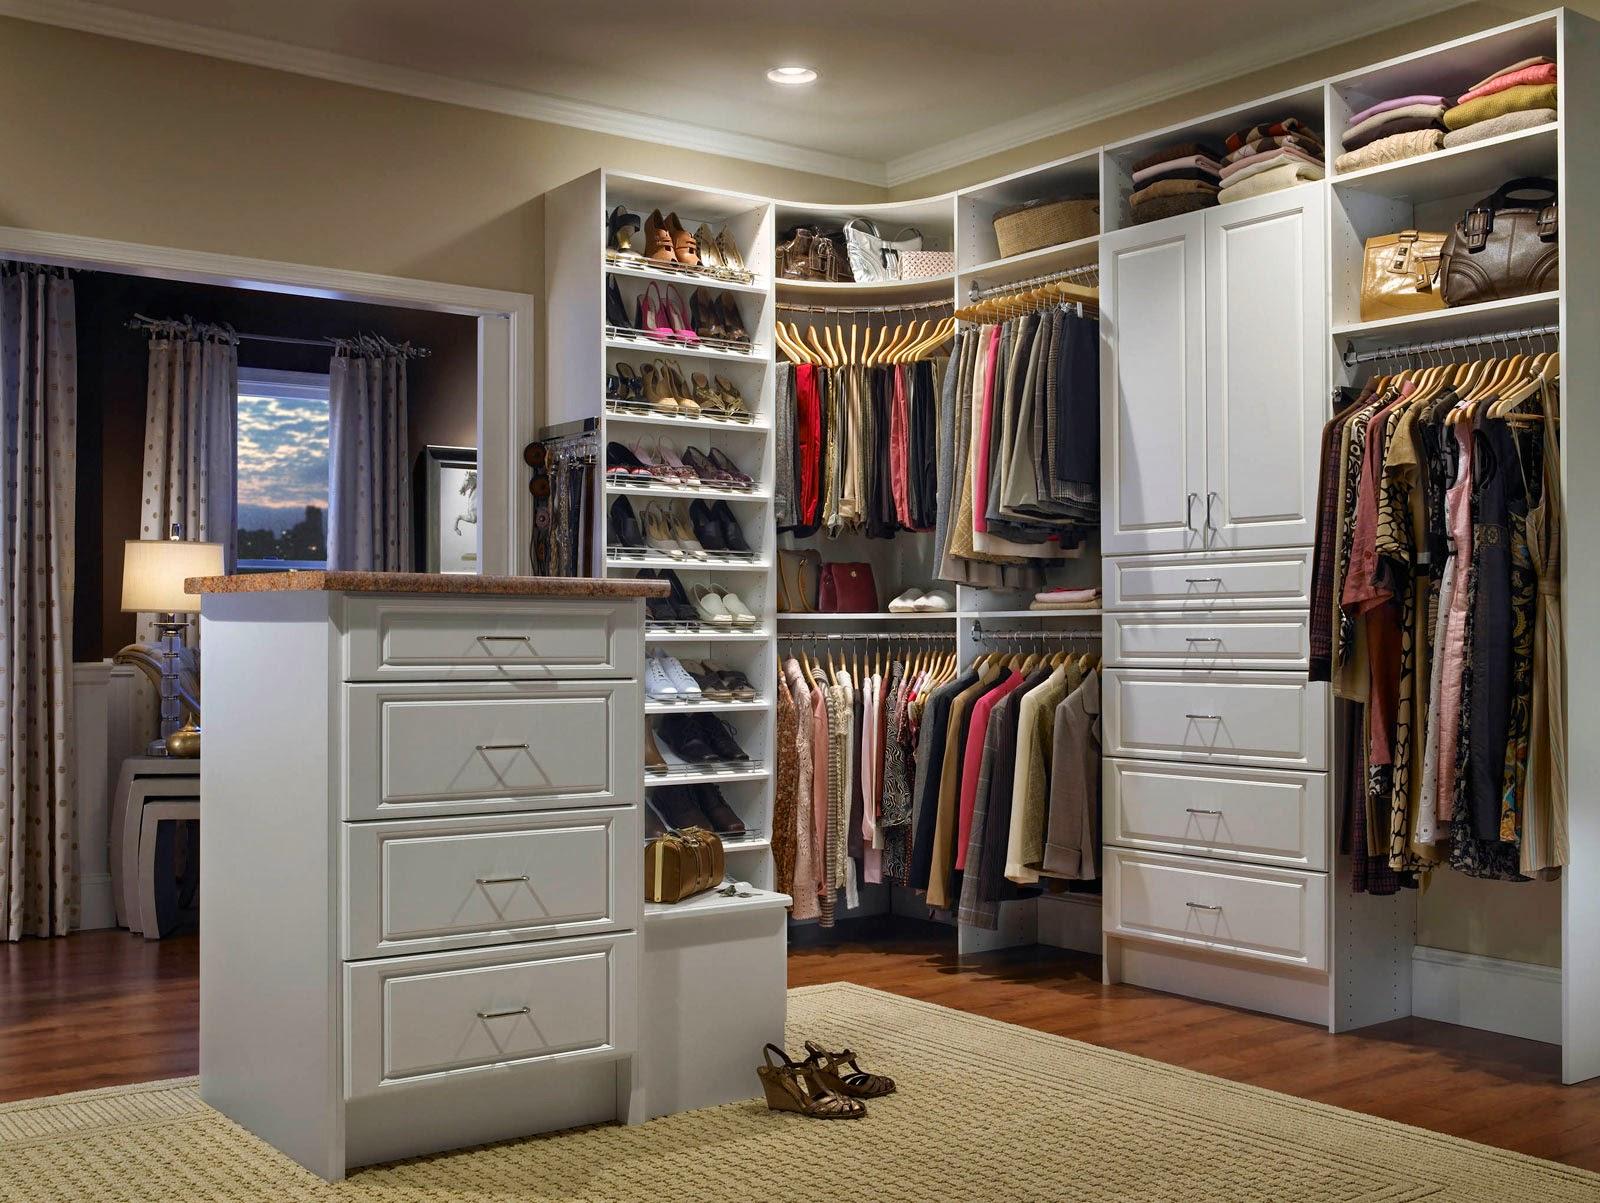 Wardrobe-Clothes-Minimalist-Simple-Design-Modern-Wardrobe